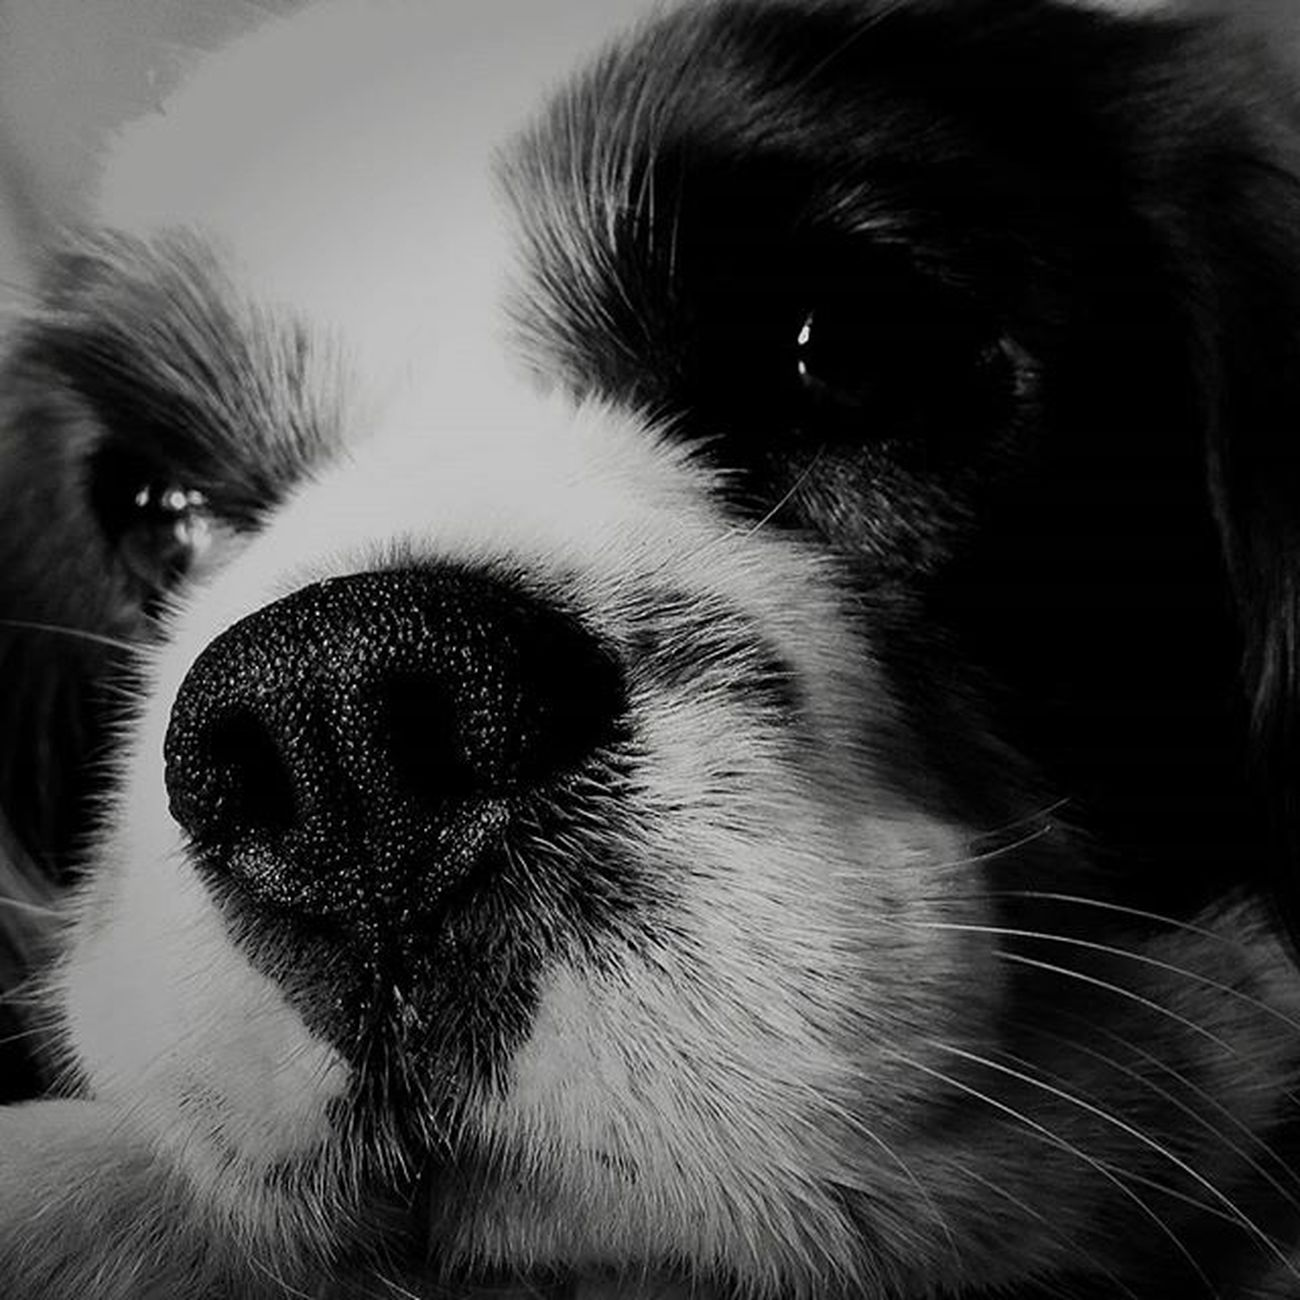 Chi non ti tradira' mai....Joey Dog_of_instagram Dogsofinstagram Cavalierkingcharlesspaniel Ck  Ckcs Amoremio Ilmiobimbopeloso Amoredellamamma Estateinsieme